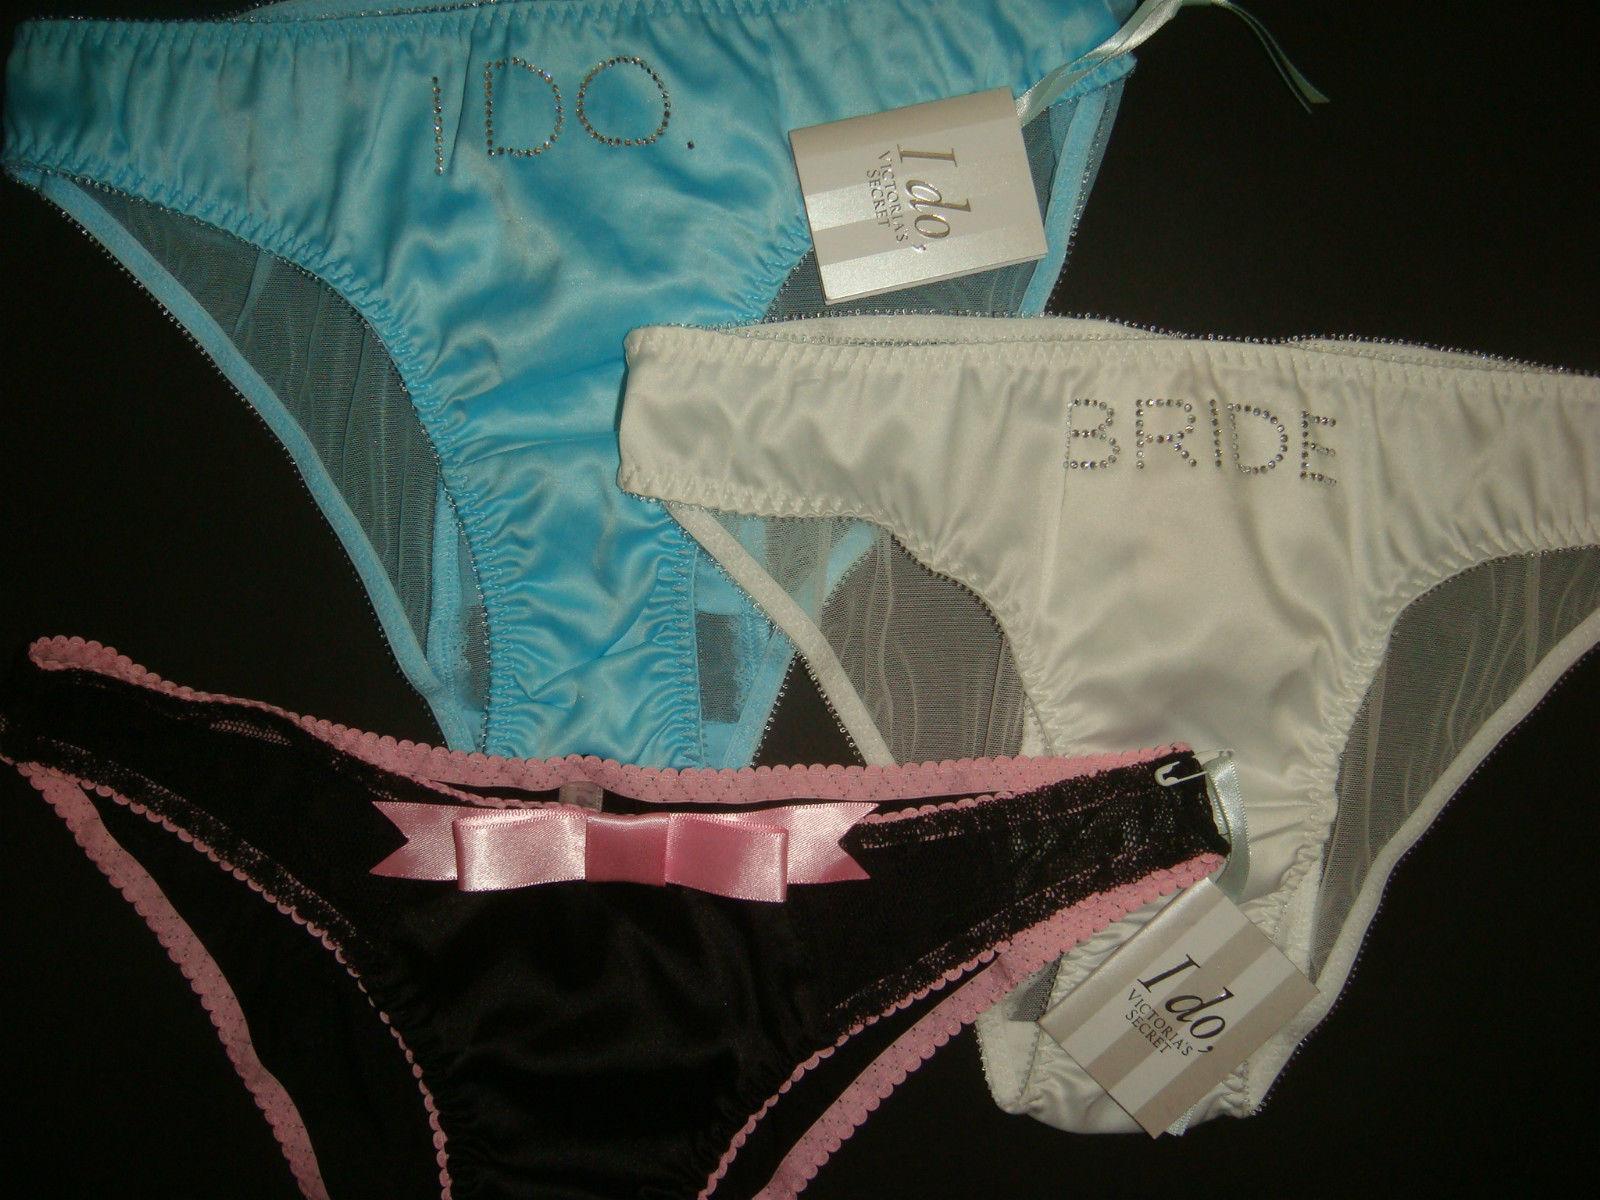 7f165203d6 NWT Victoria s Secret S BABYDOLL+panty crystallized BLUE white black I DO  BRIDAL